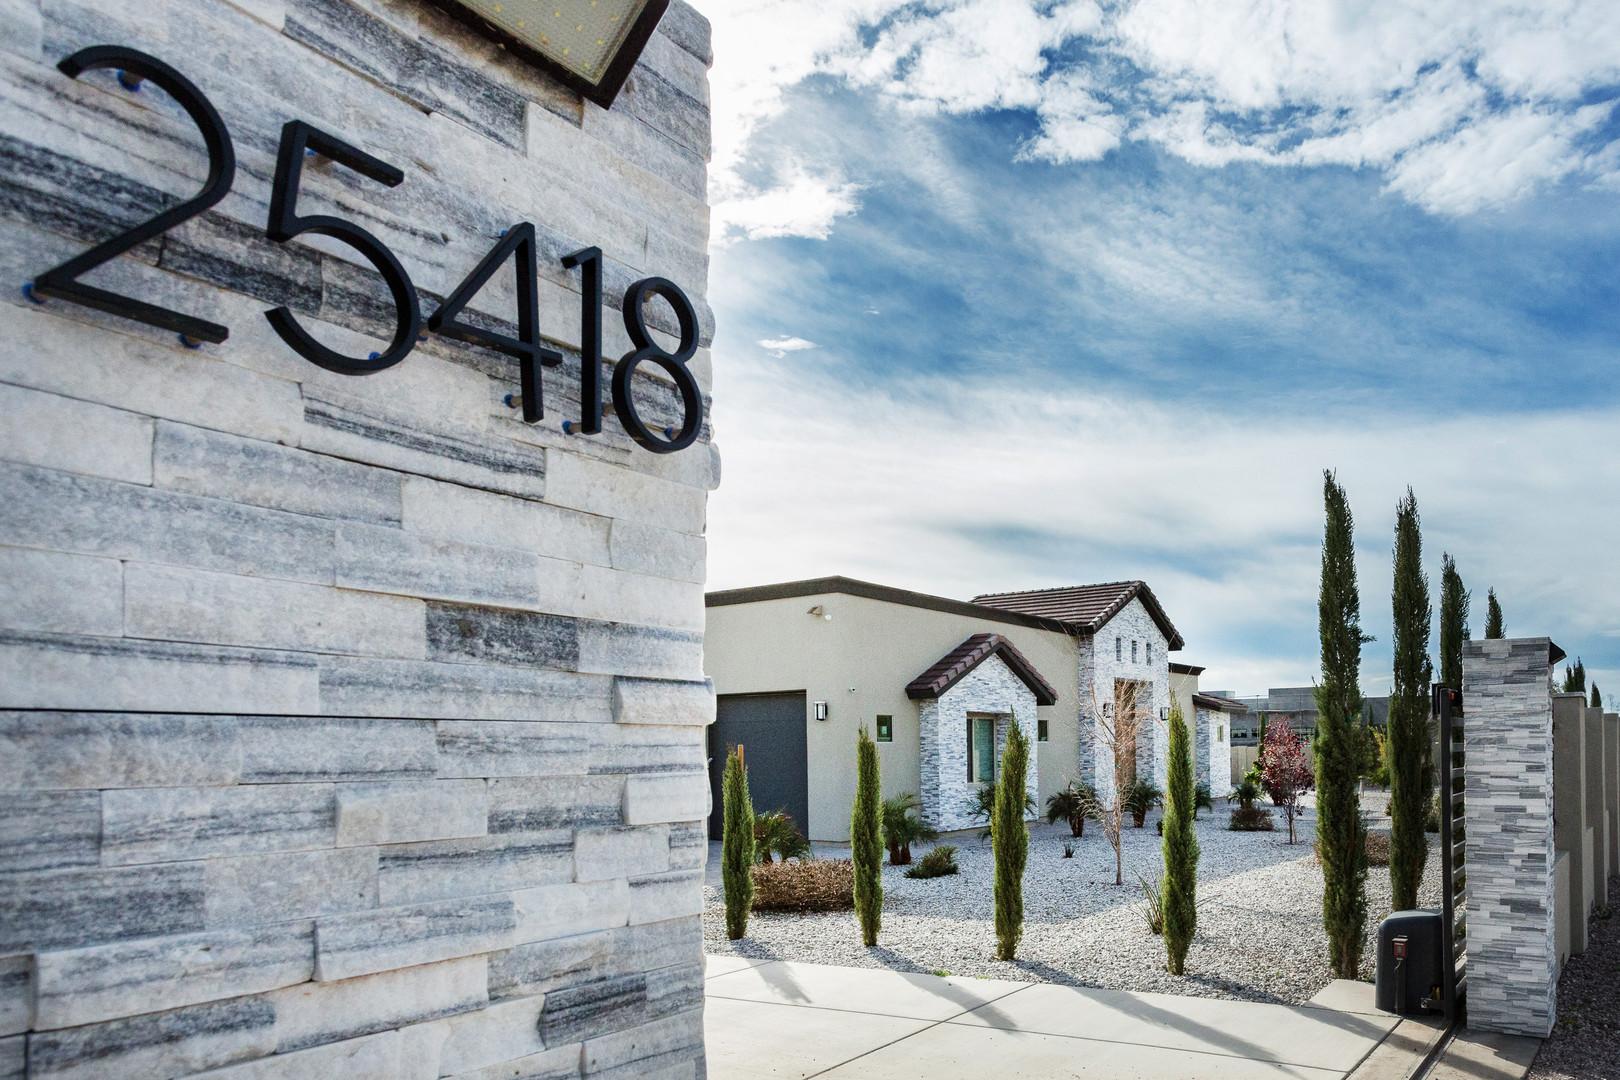 Phoeonix Real Estate